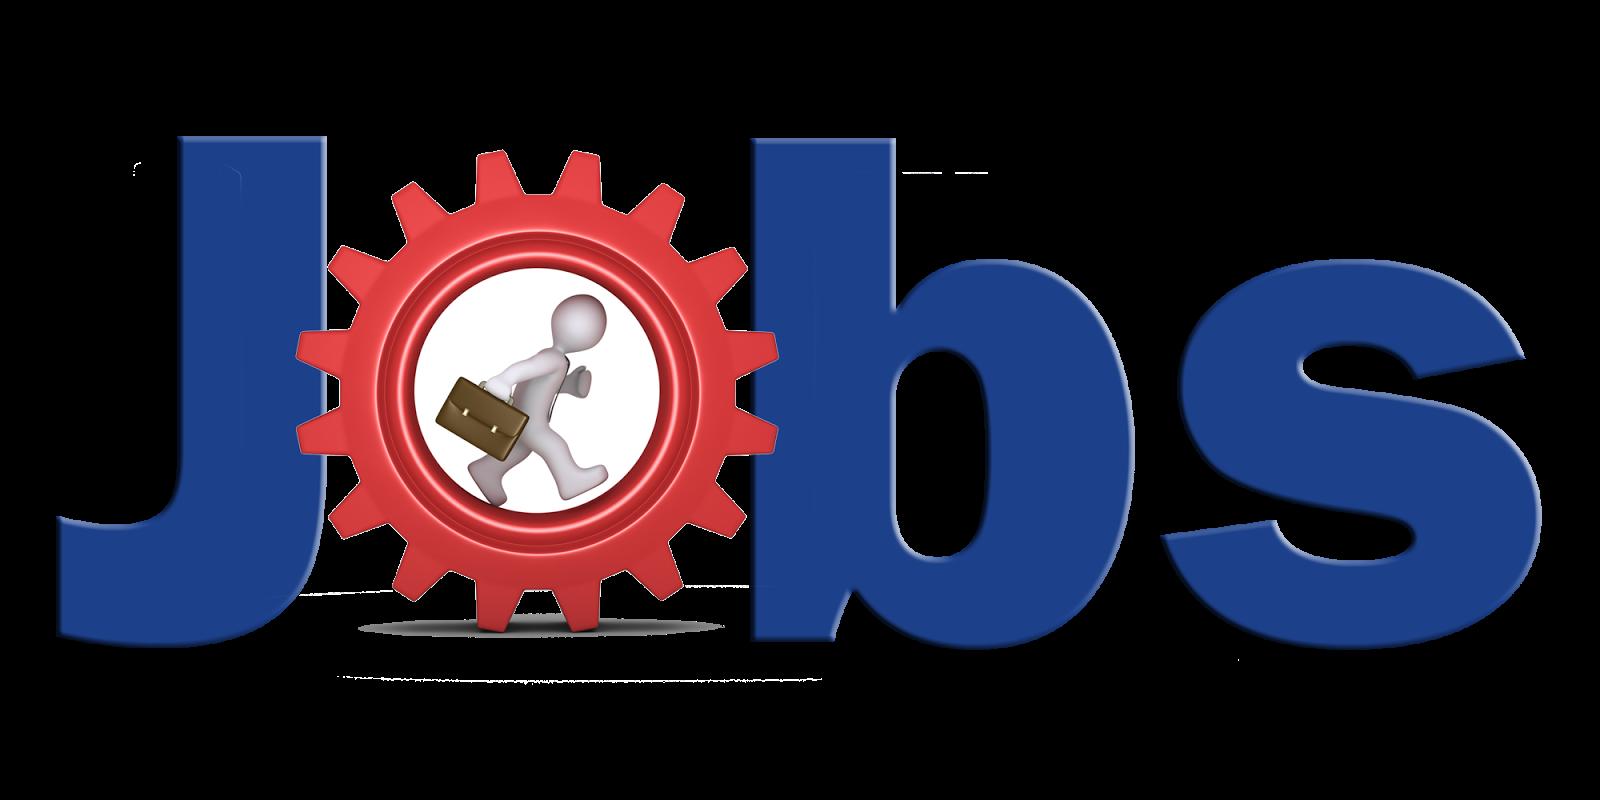 the best 50 job websites portals for your unemployment the best 50 job websites portals for your unemployment